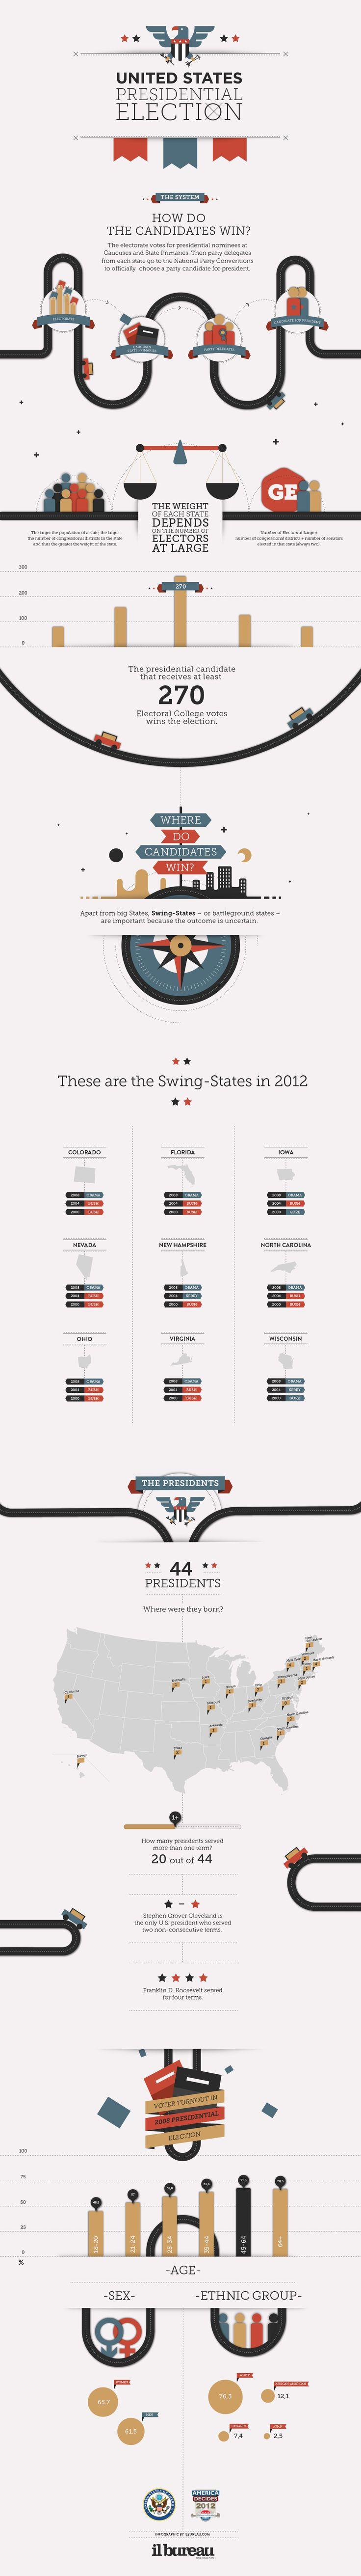 il Bureau - Presidential Election - infographic